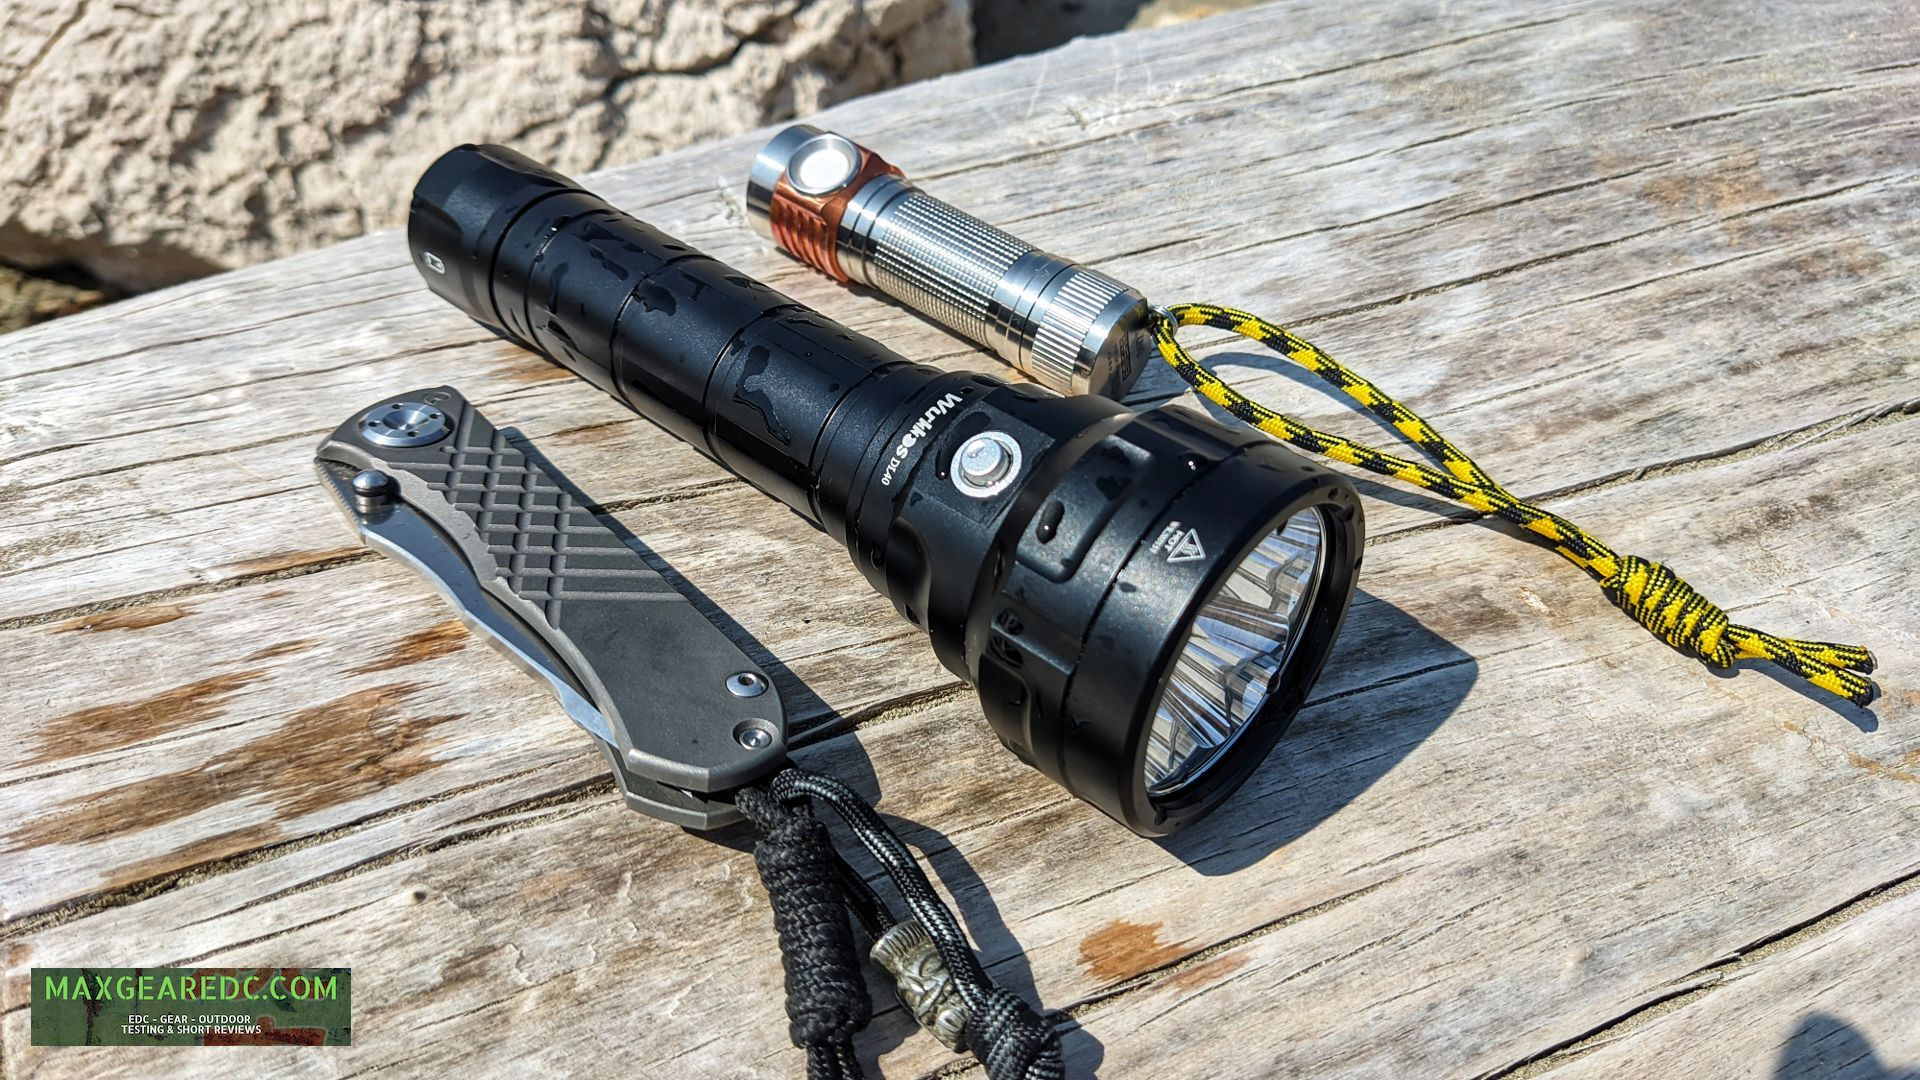 Wurkkos_DL40_Diving_Flashlight_Review_Aluminium_26650_maxgearedc.com_EDC_GEAR_OUTDOOR_TESTING_and_SHORT_REVIEWS_20